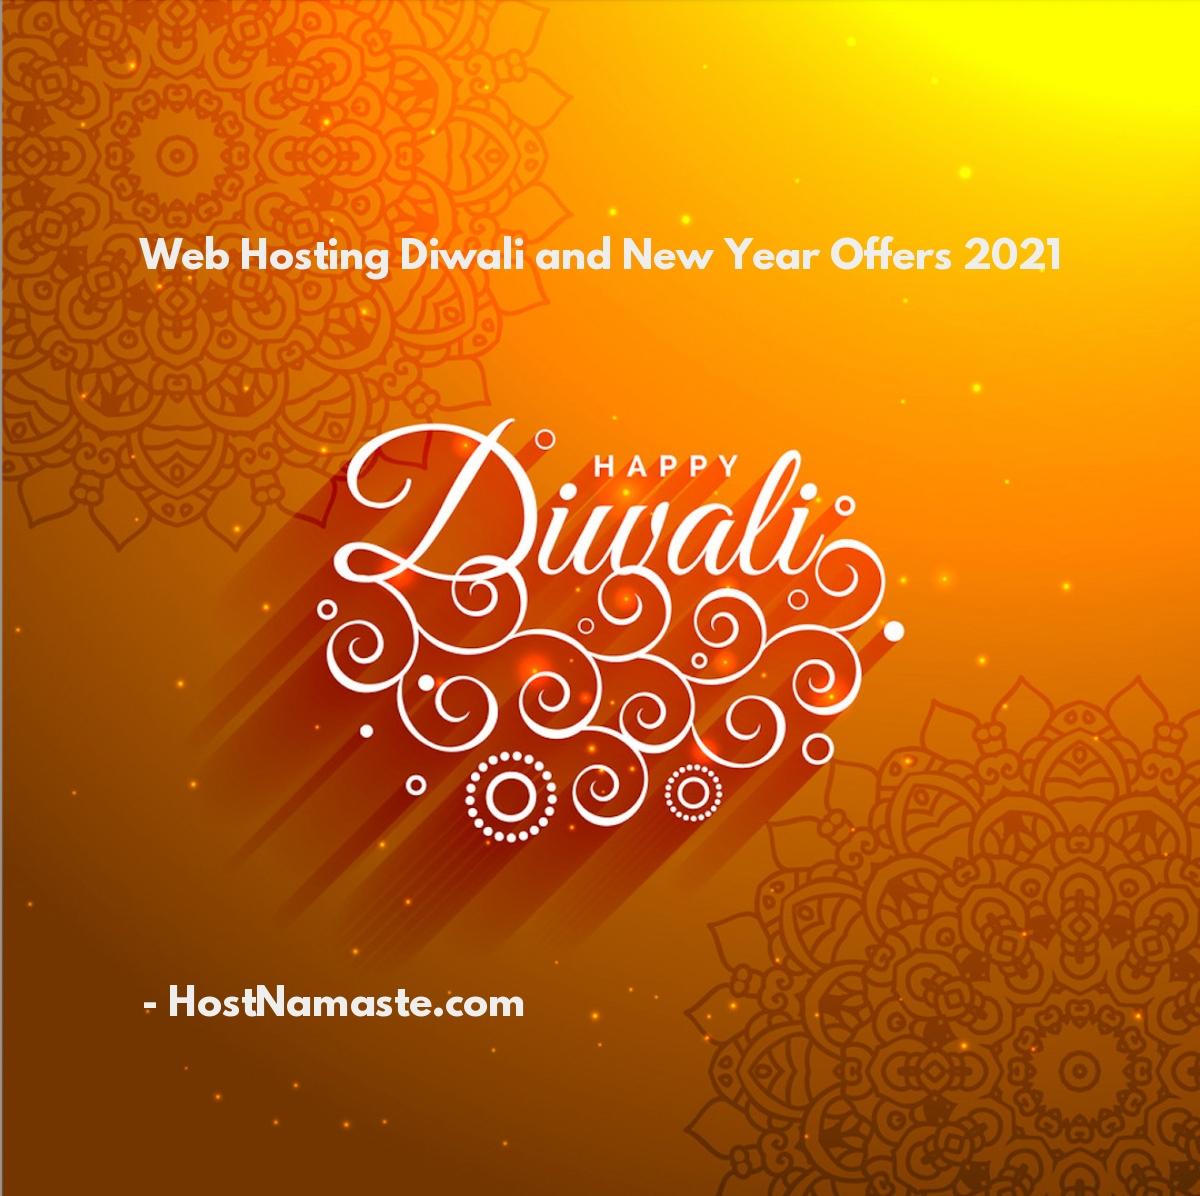 Web Hosting Happy Diwali and New Year Offers 2021 – HostNamaste